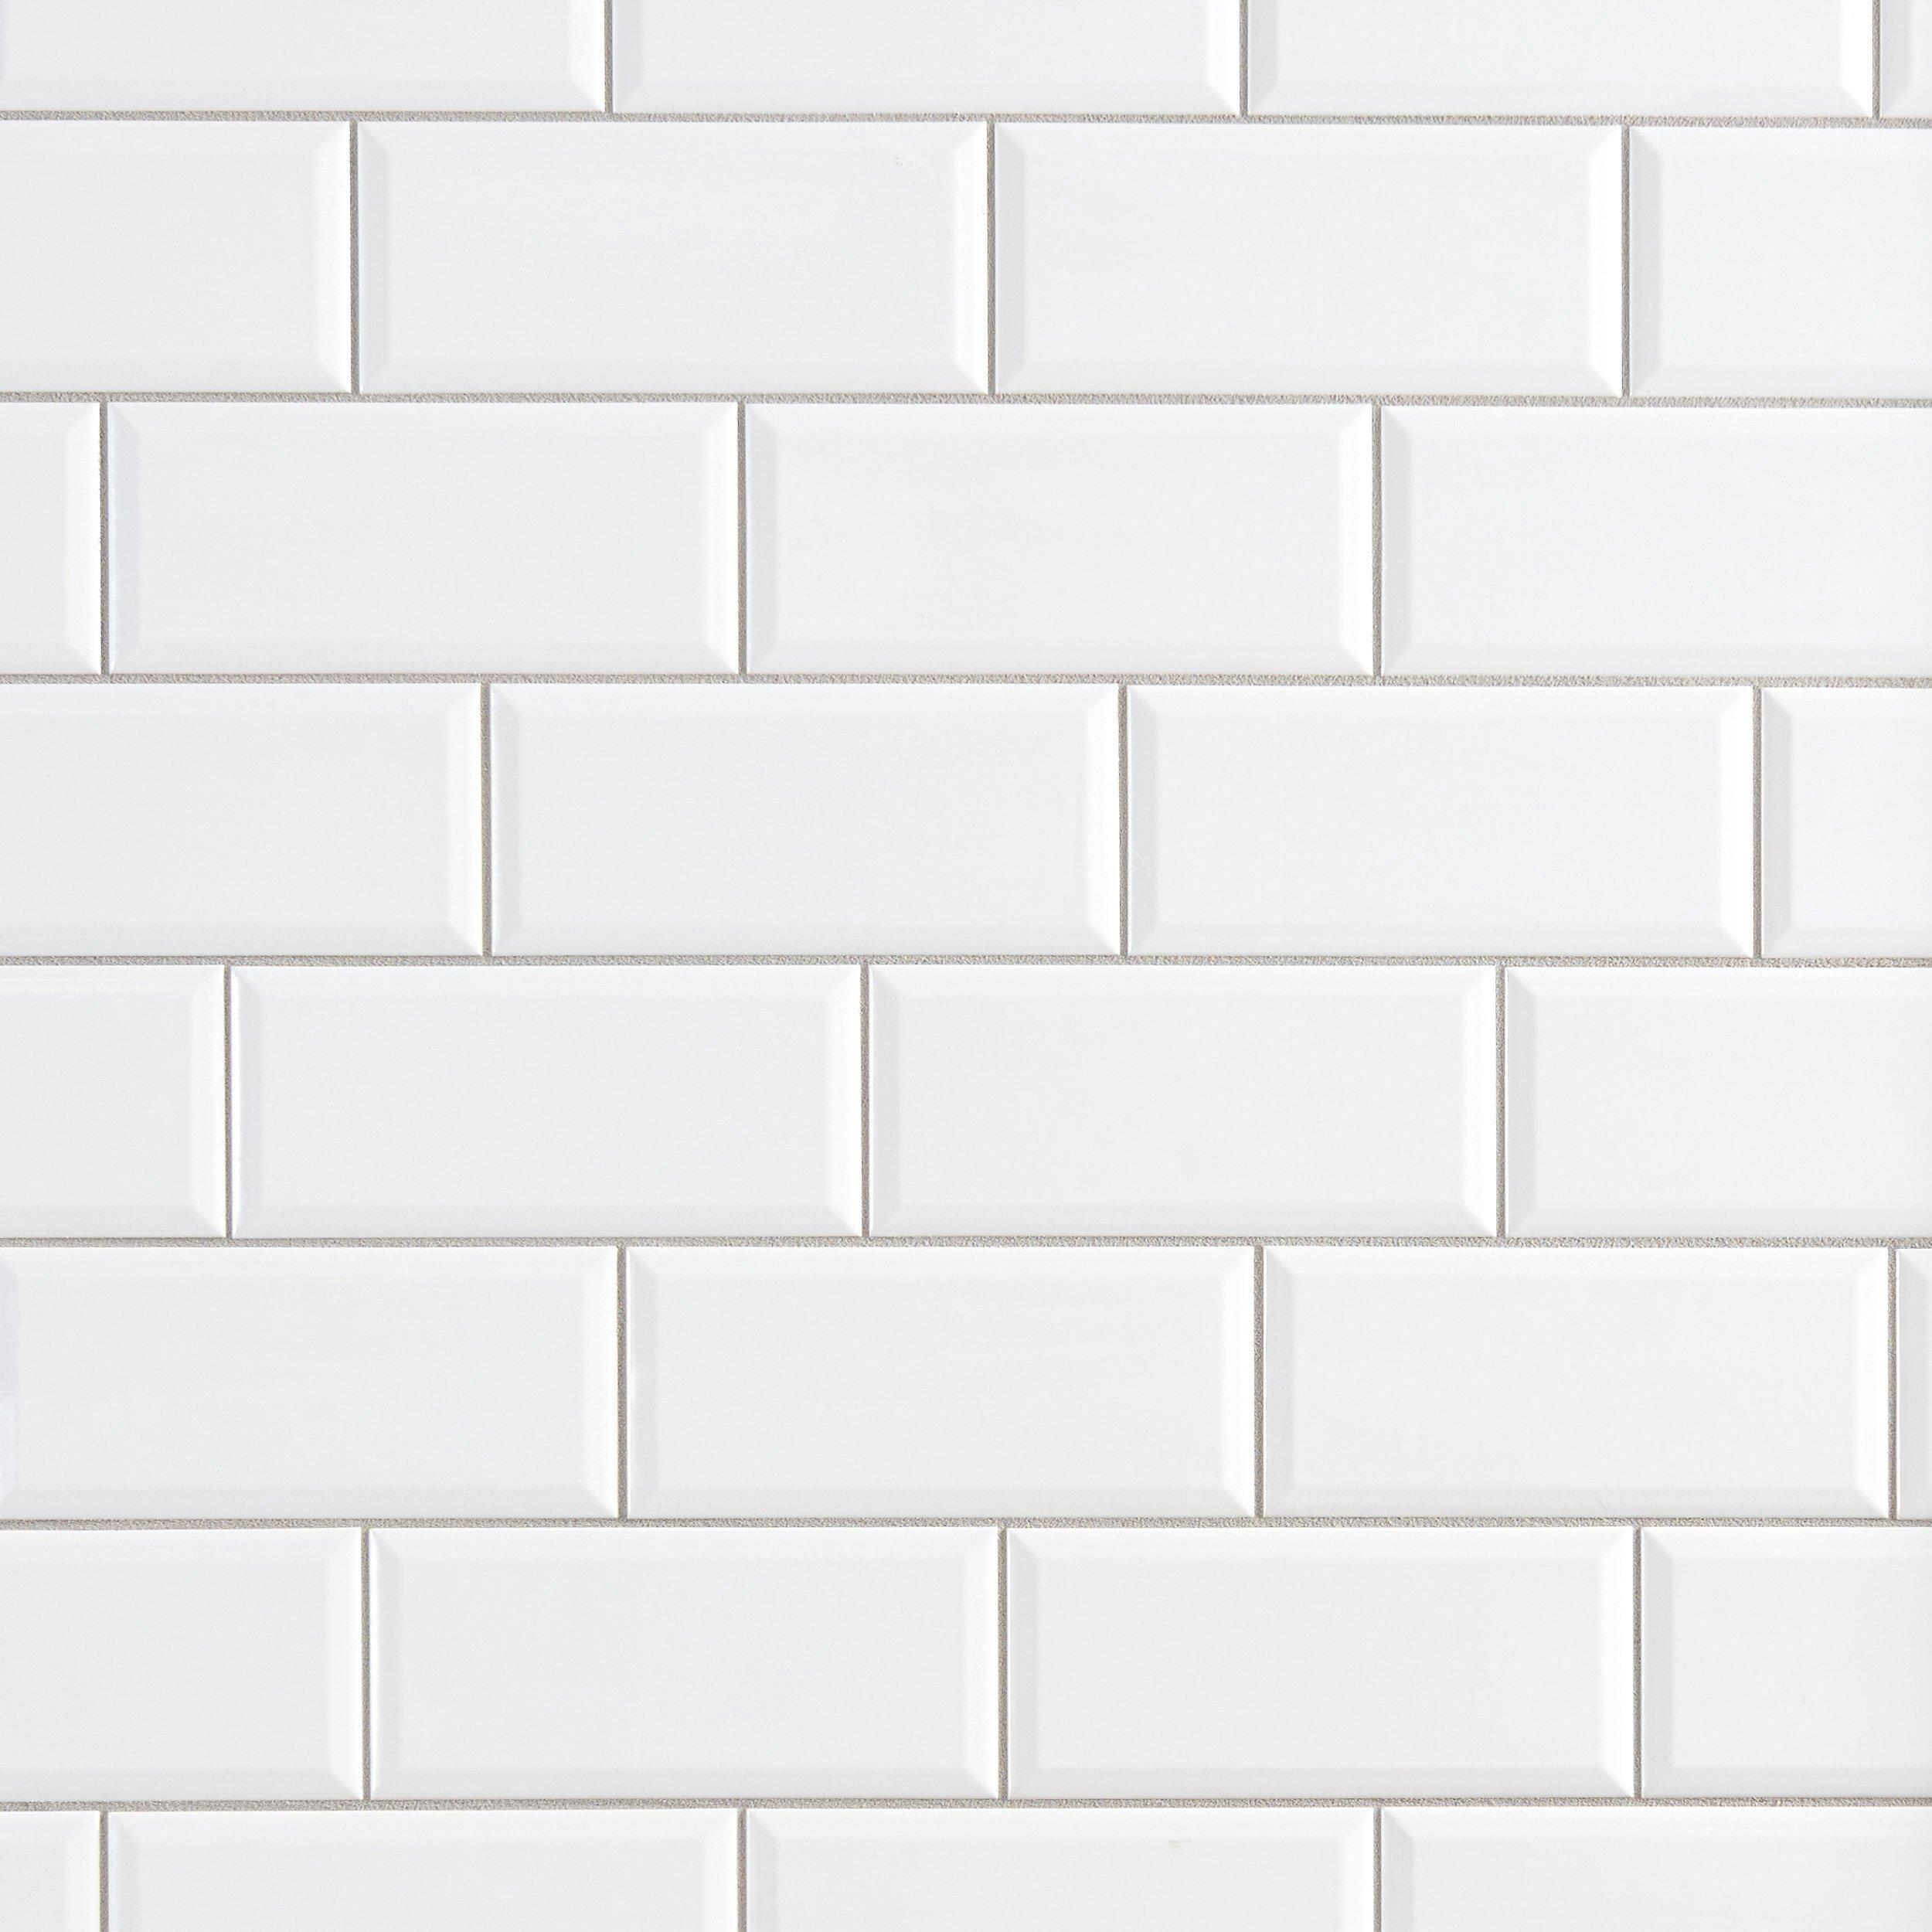 Bright White Ice Beveled Ceramic Wall Tile Ceramic Wall Tiles Ceramic Floor Tiles Wall Tiles